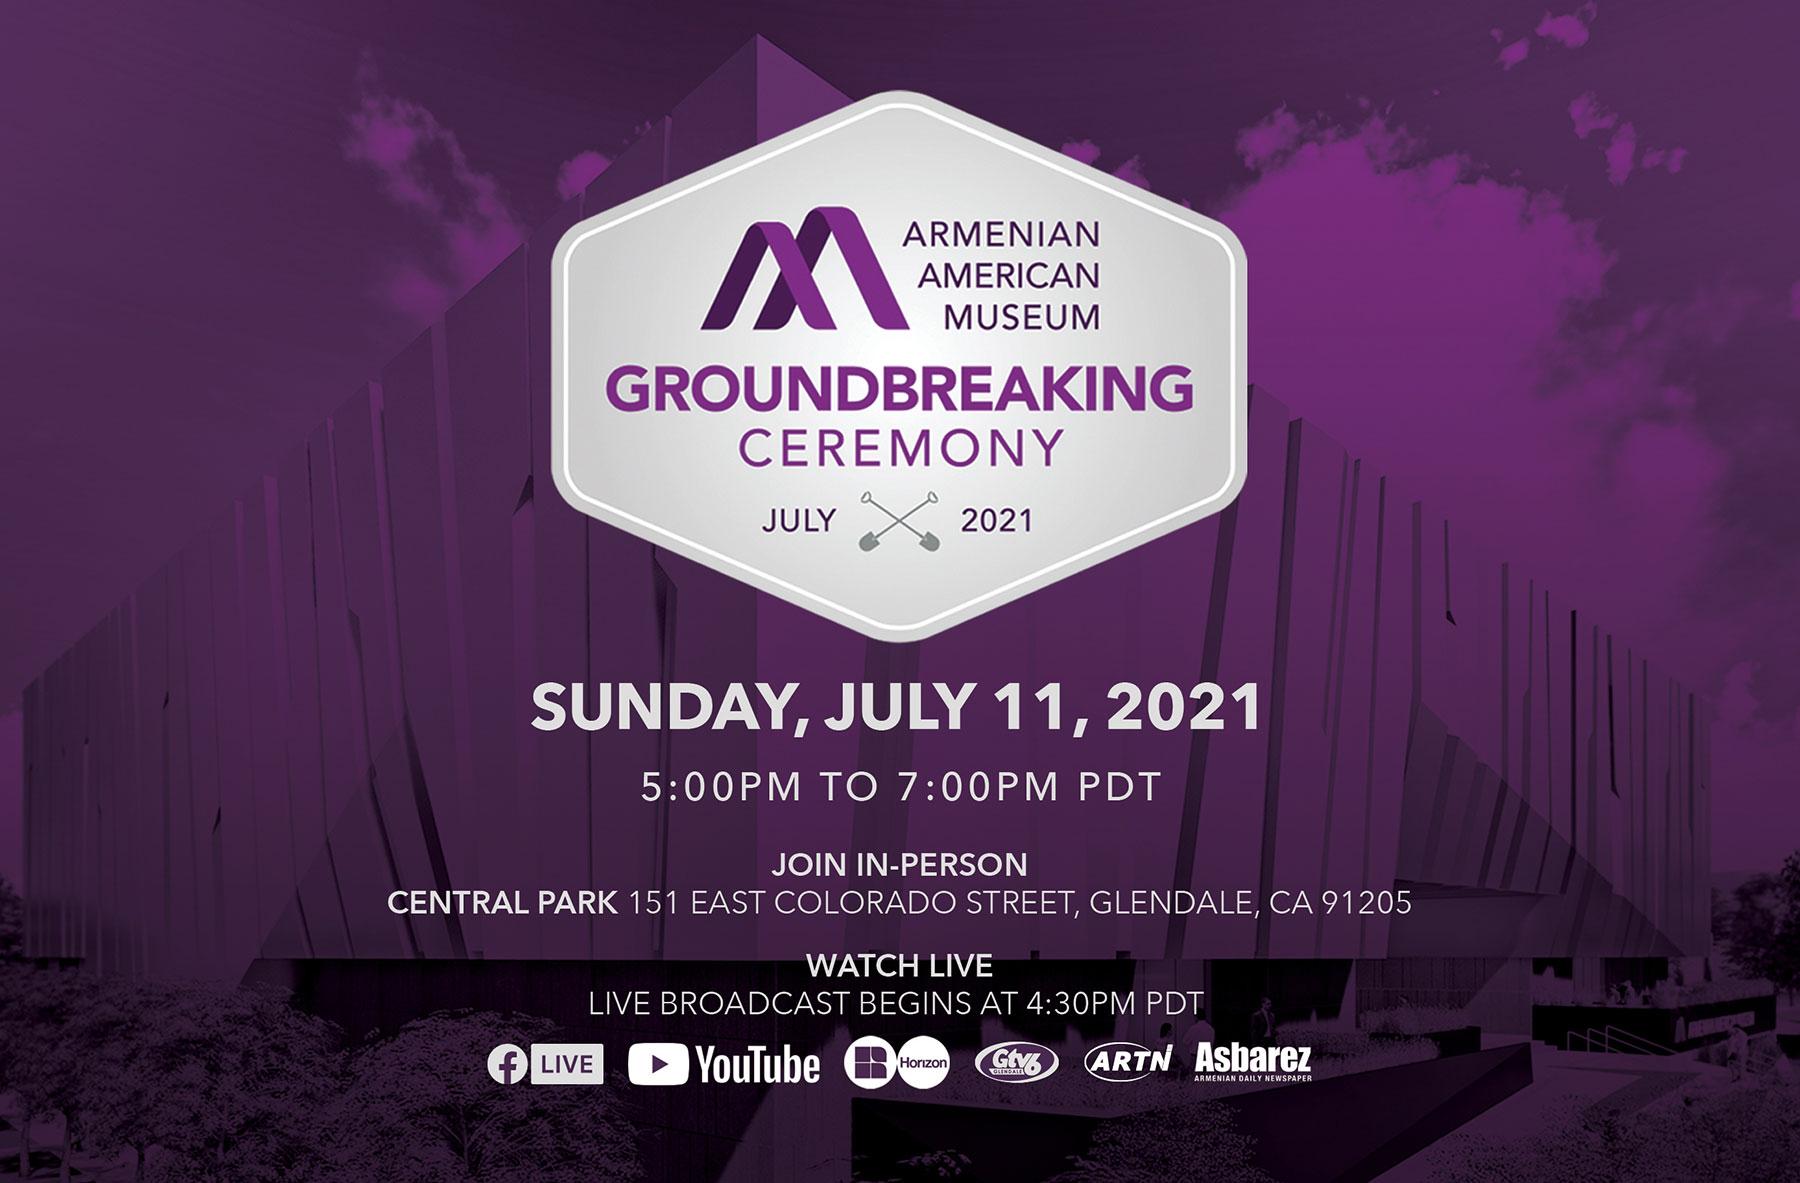 AAMCCC Groundbreaking Ceremony Event Flyer